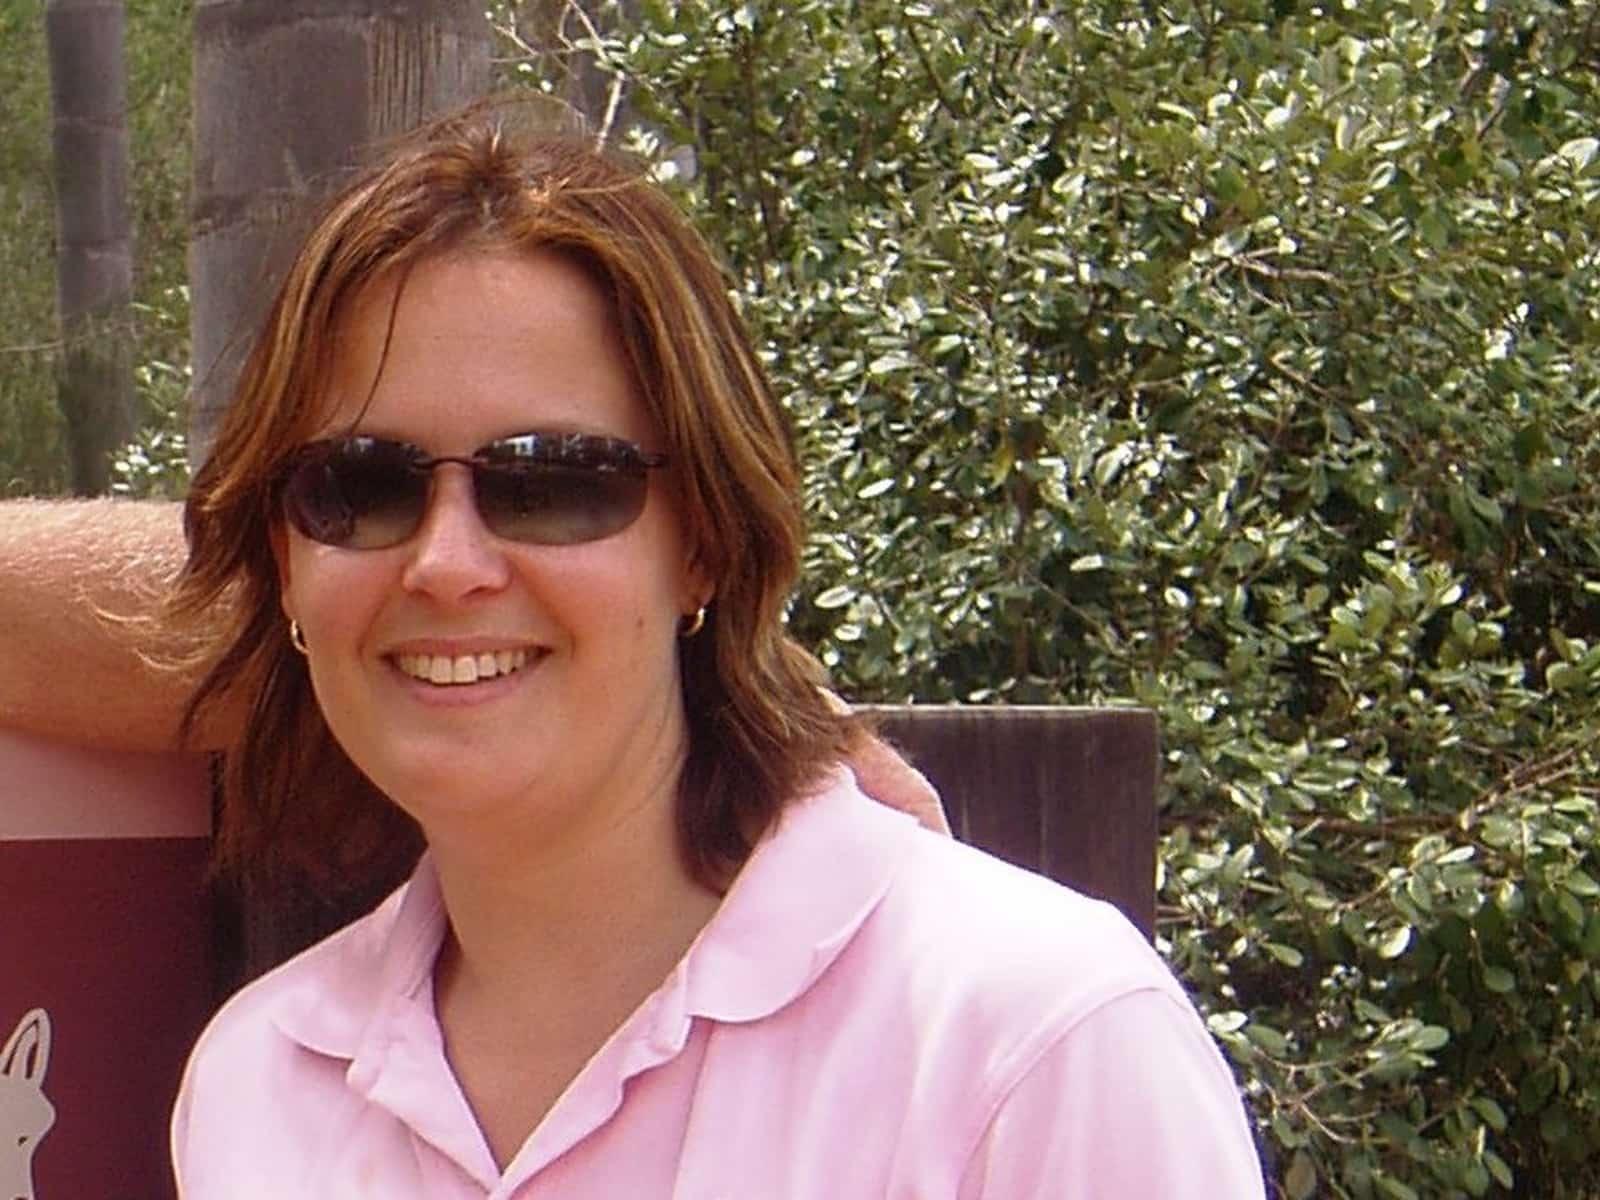 Kate from Singleton, New South Wales, Australia